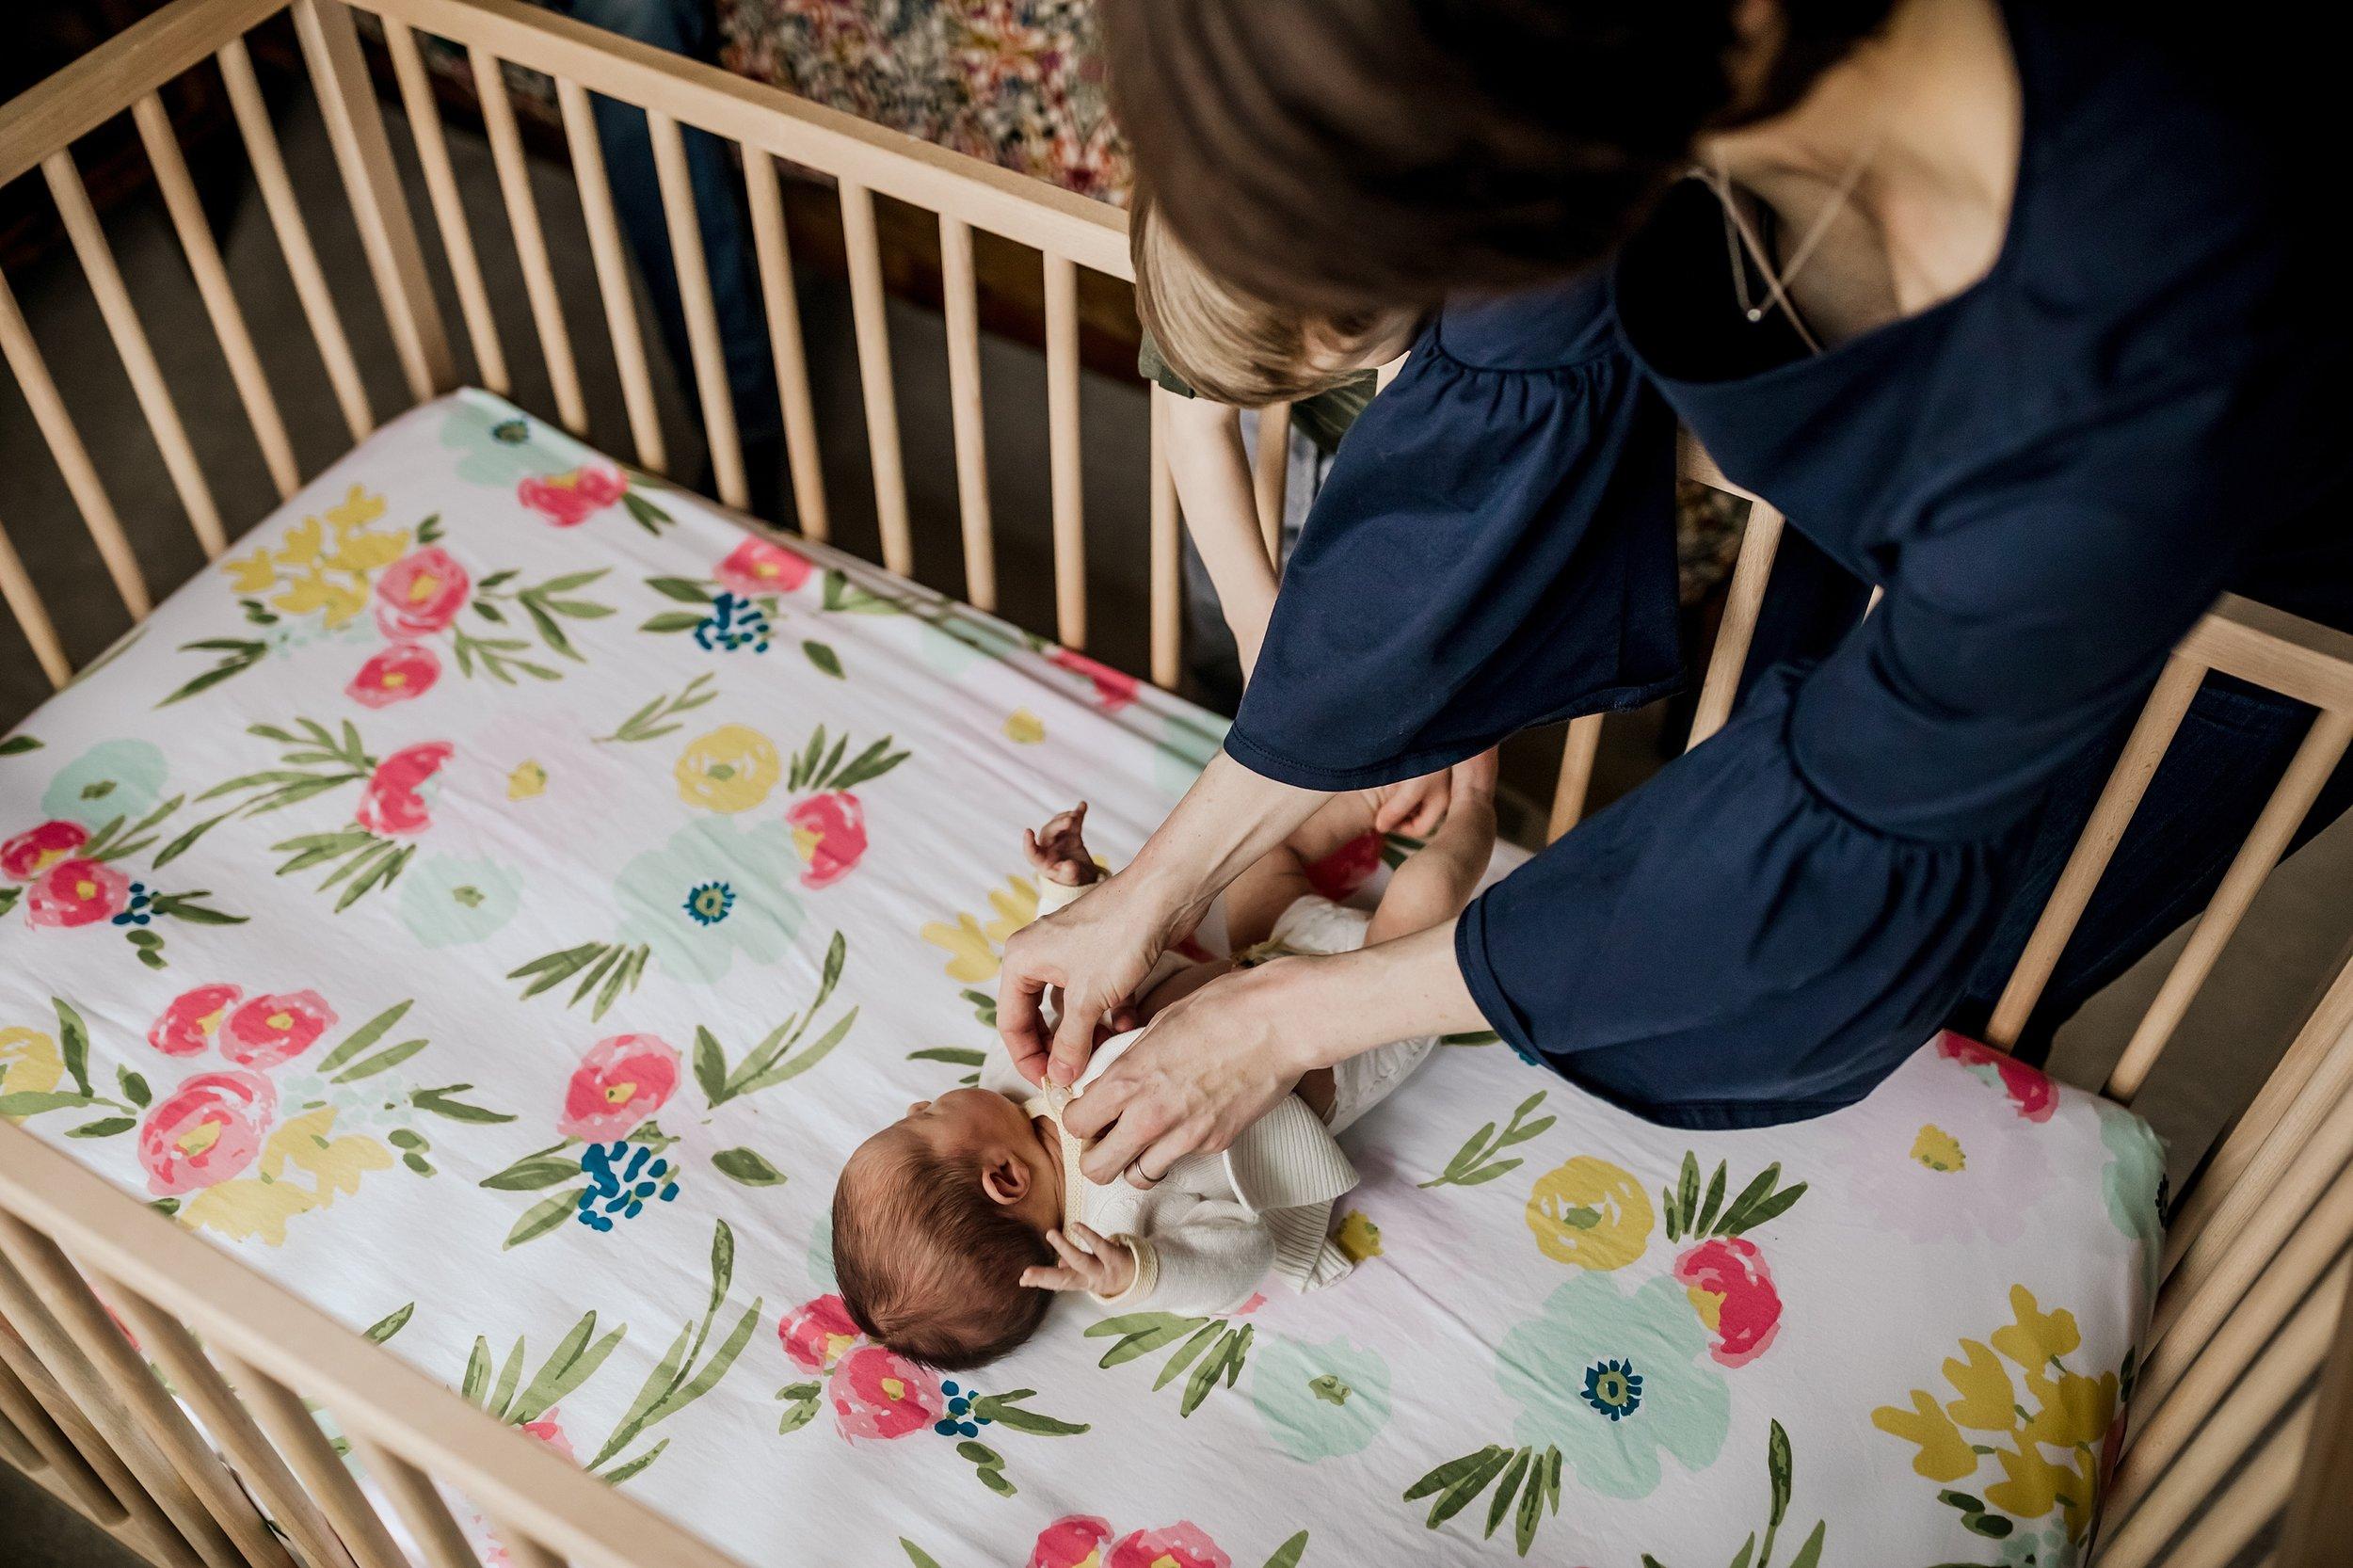 Lehigh-Valley-Newborn-Documentary-Photographer_0032.jpg